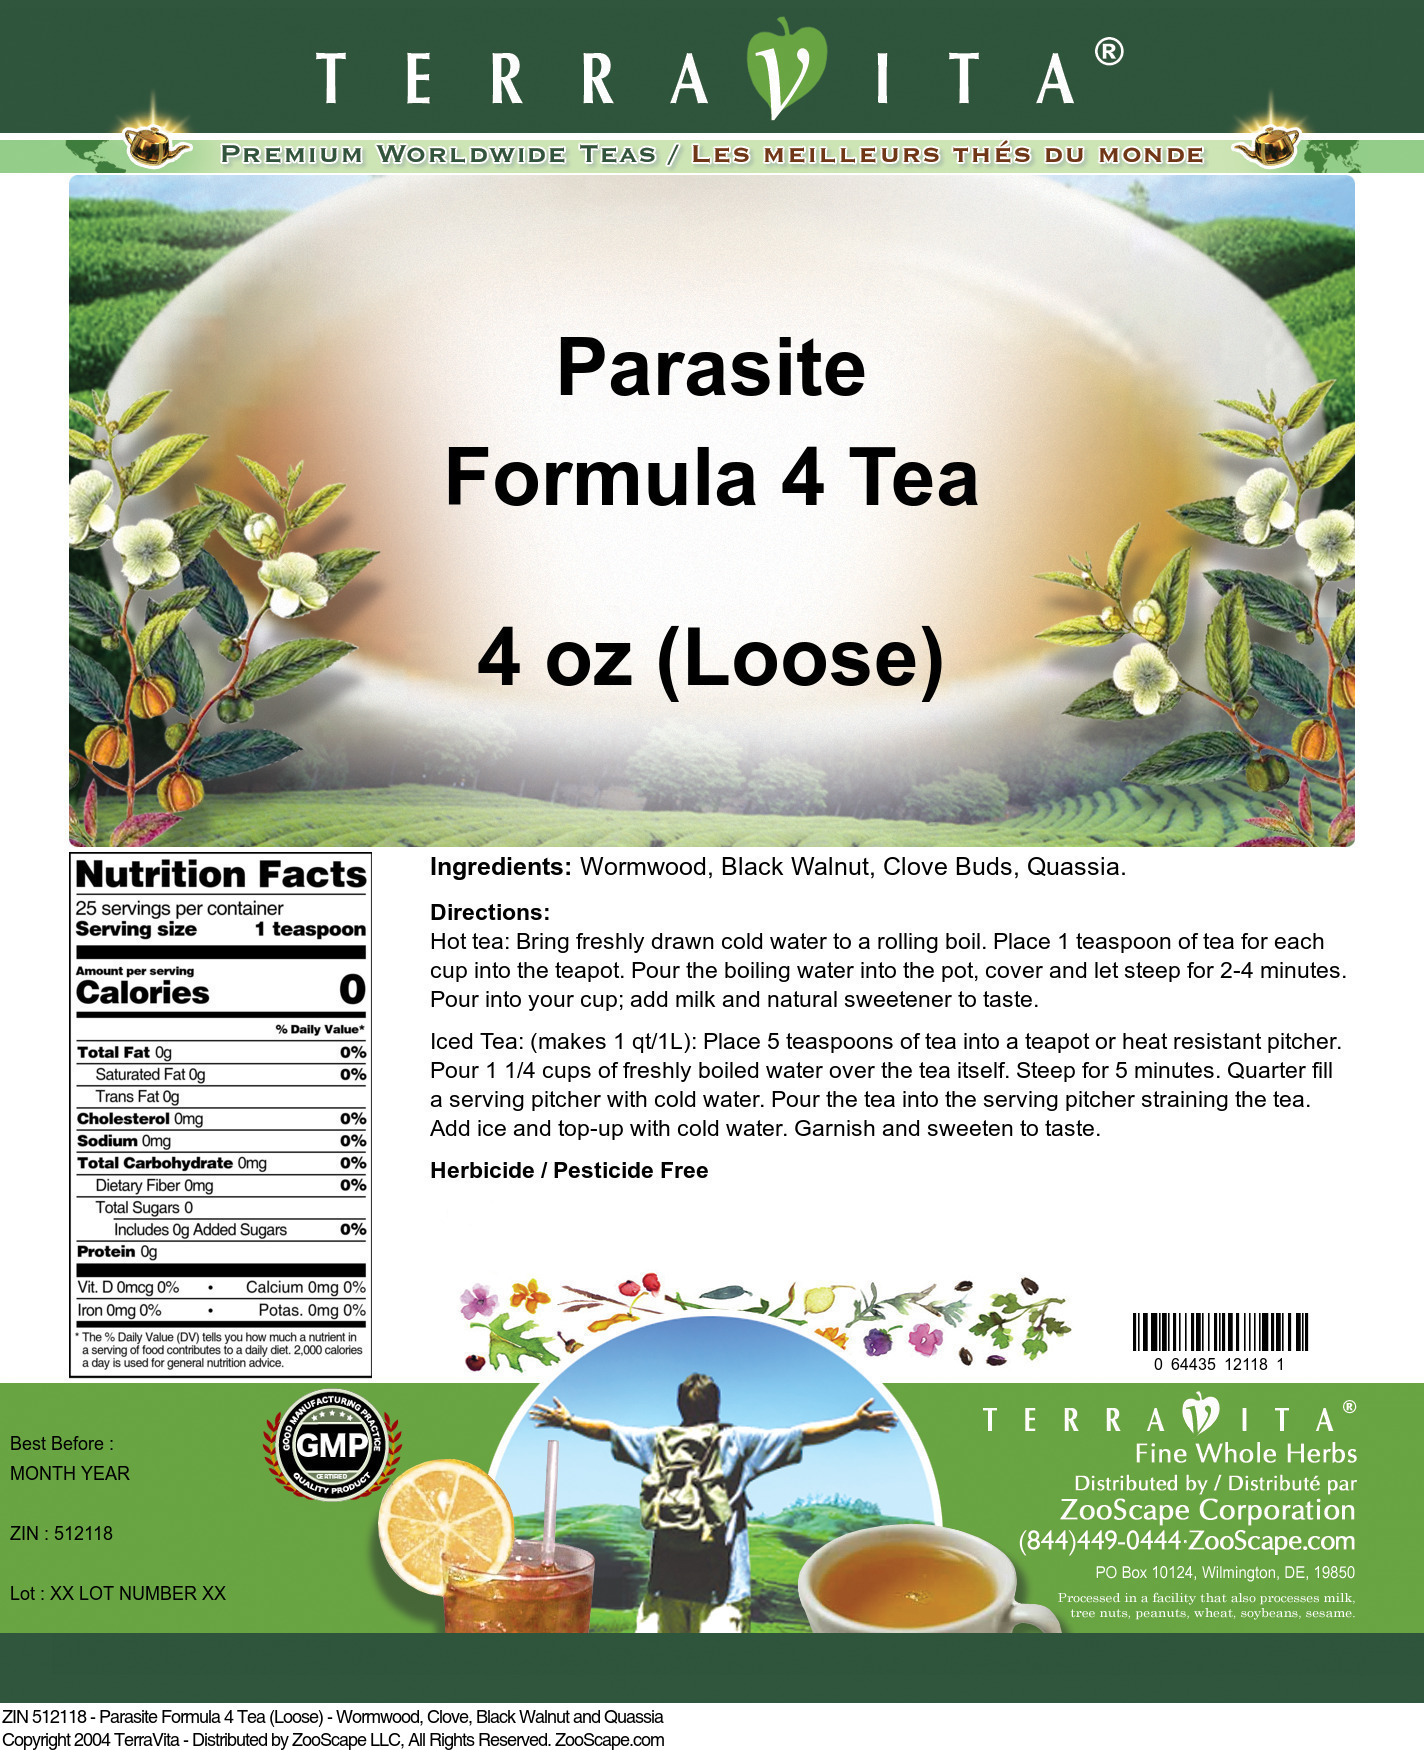 Parasite Formula 4 Tea (Loose) - Wormwood, Clove, Black Walnut and Quassia